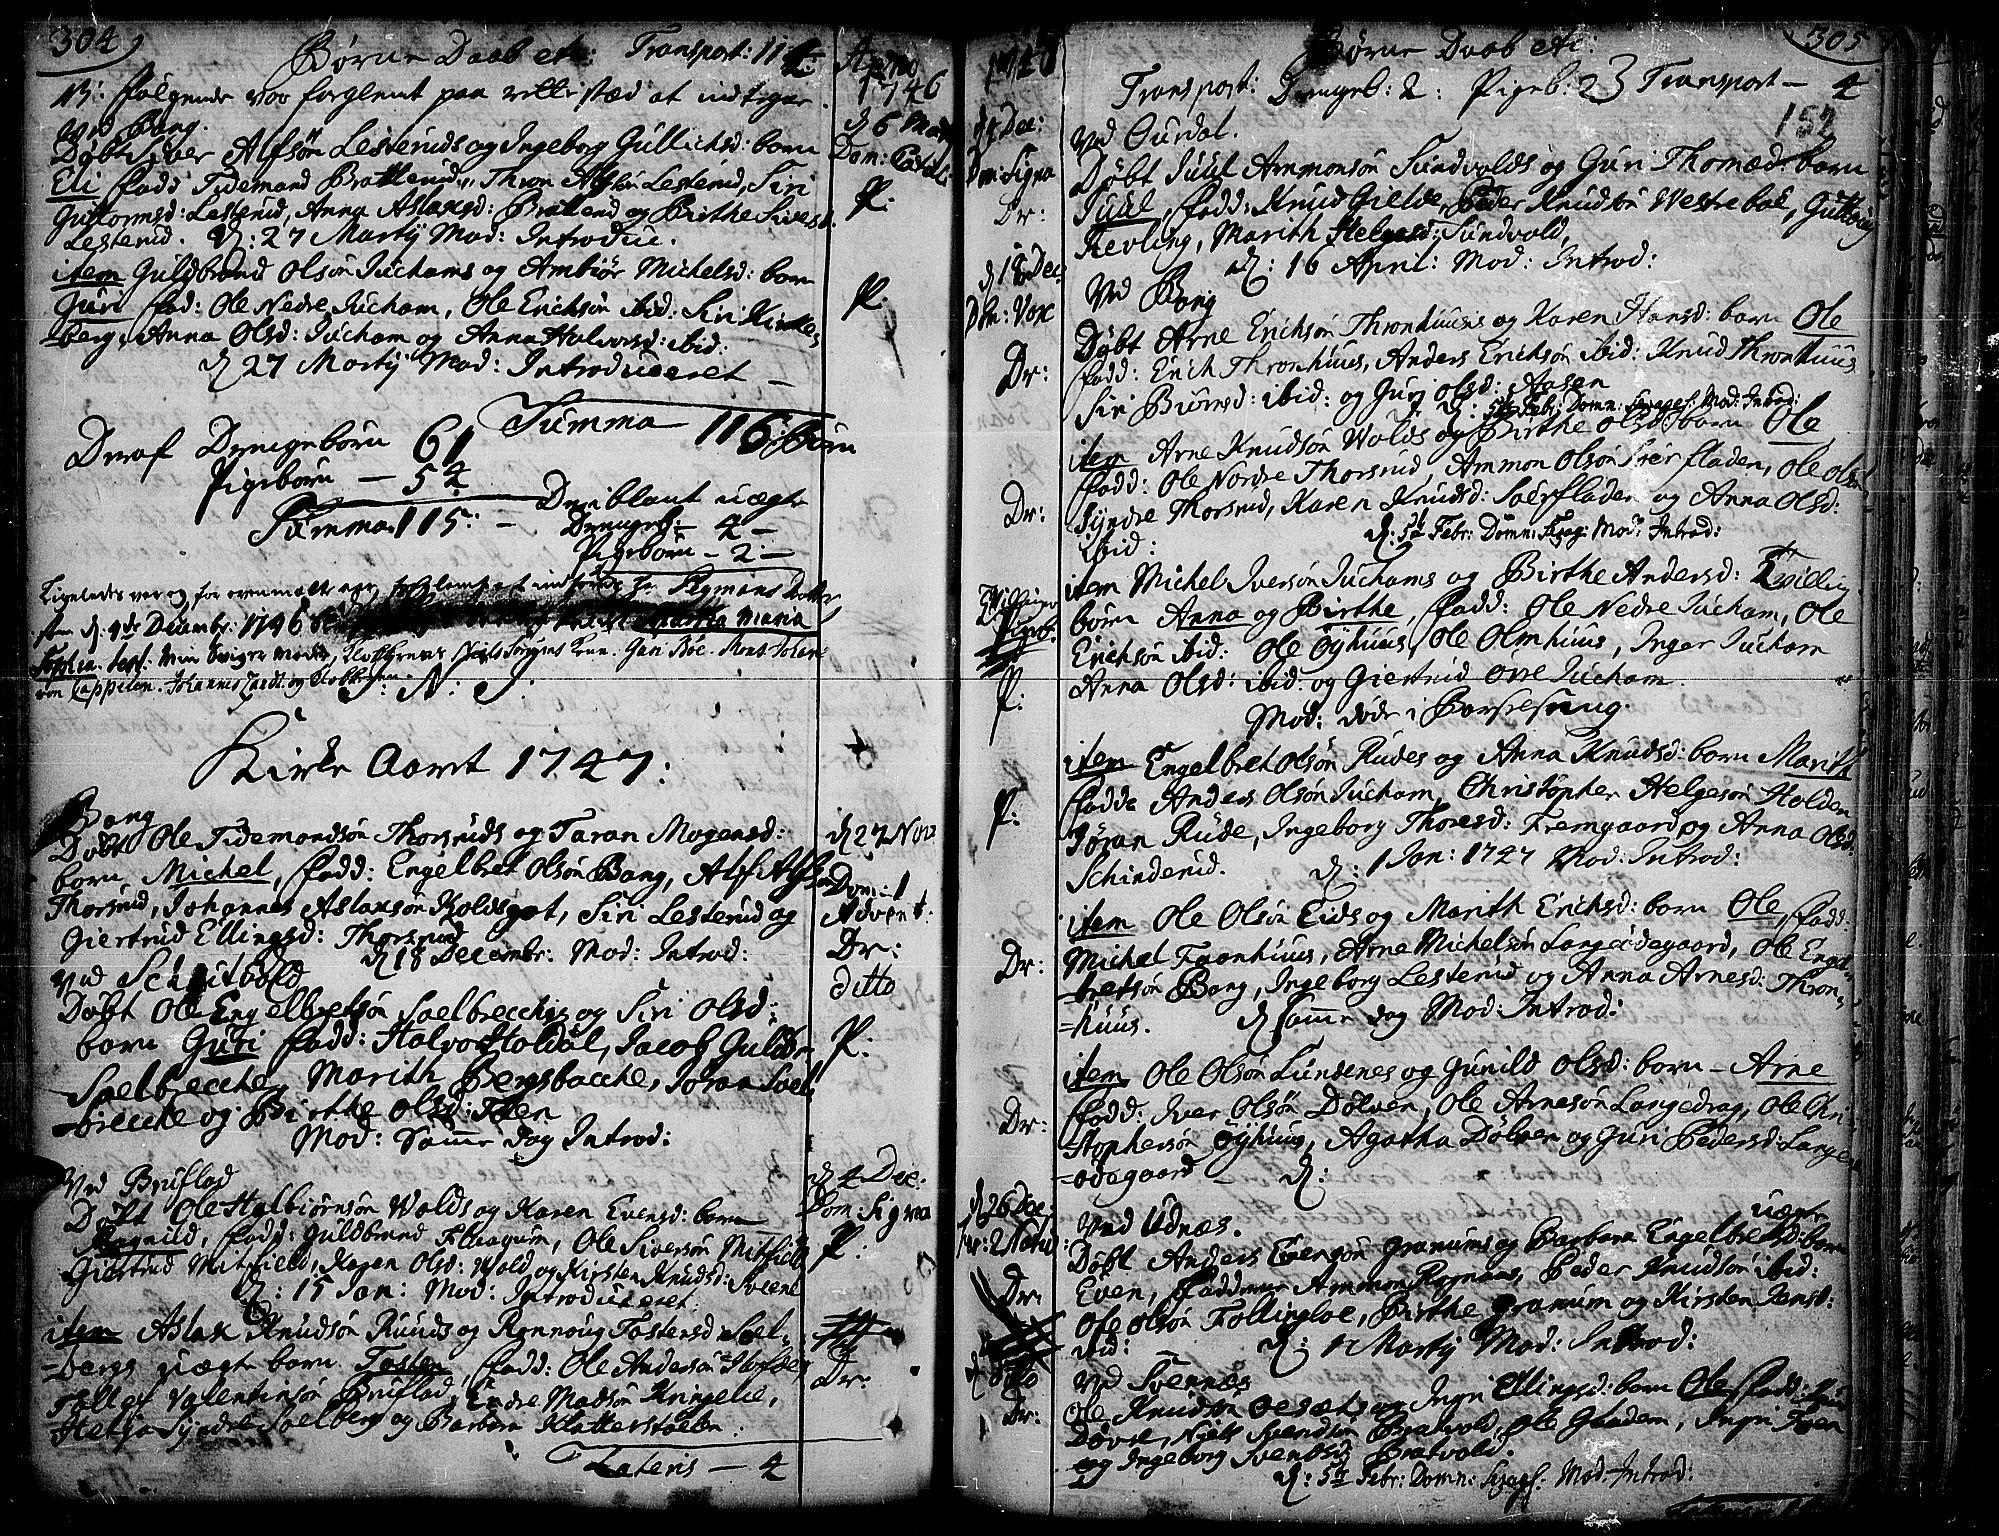 SAH, Aurdal prestekontor, Ministerialbok nr. 4, 1730-1762, s. 304-305